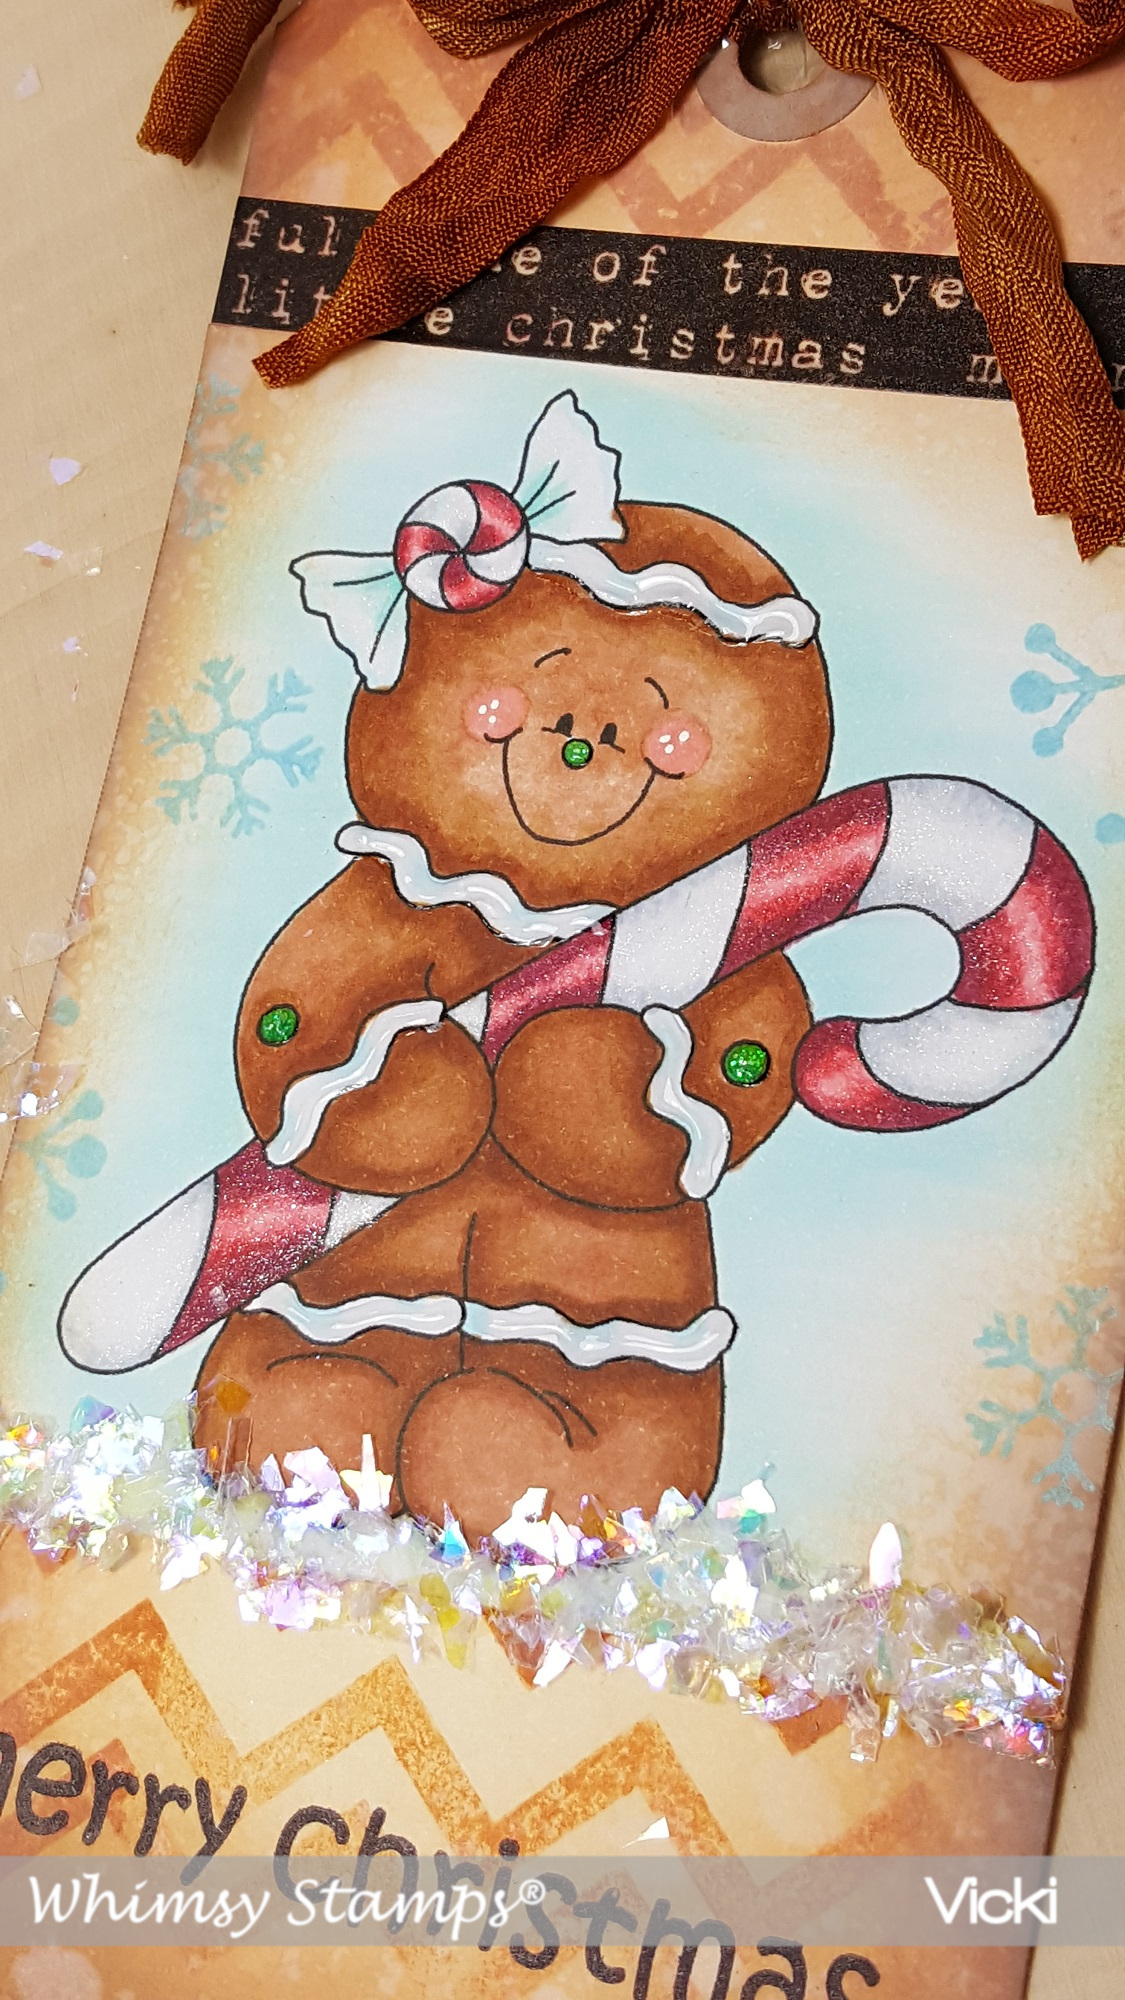 Vicki-WS-Oct24-gingerbread-close